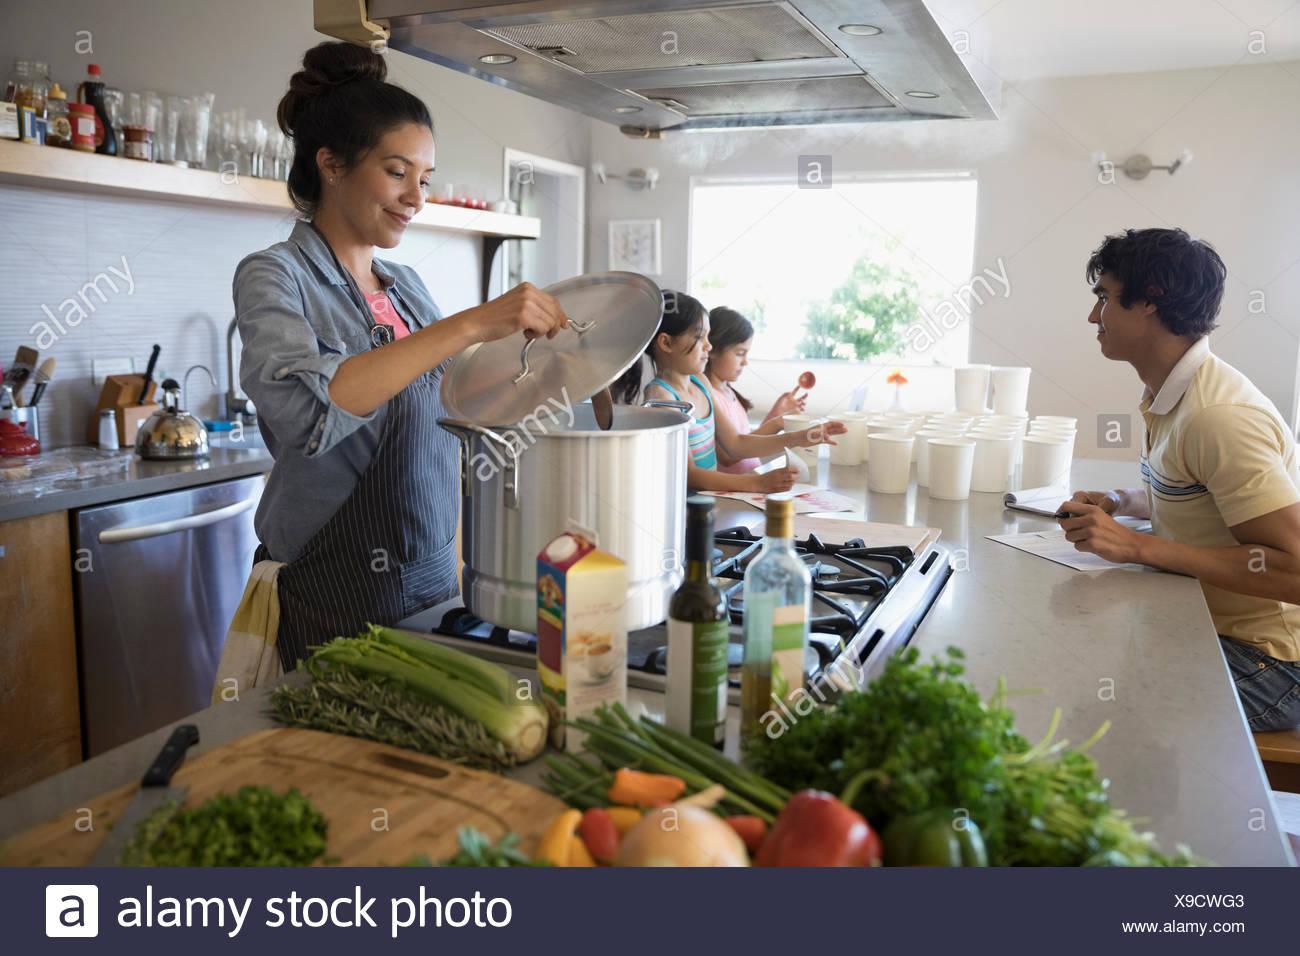 Family preparing vegetable stock in kitchen - Stock Image